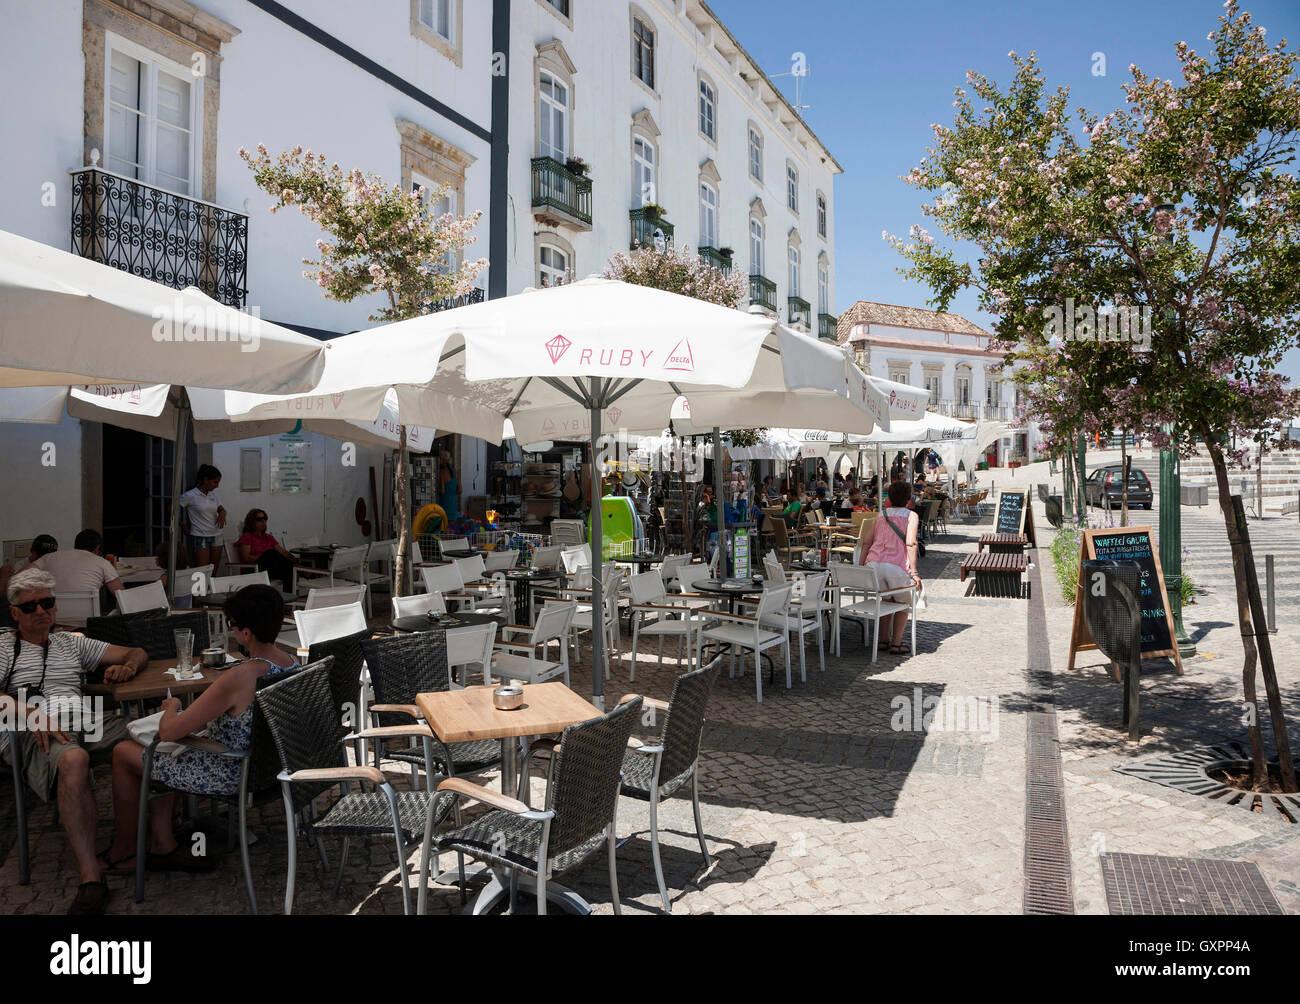 Cafés Restaurants Town Tavira Algarve Portugal Stock Photo